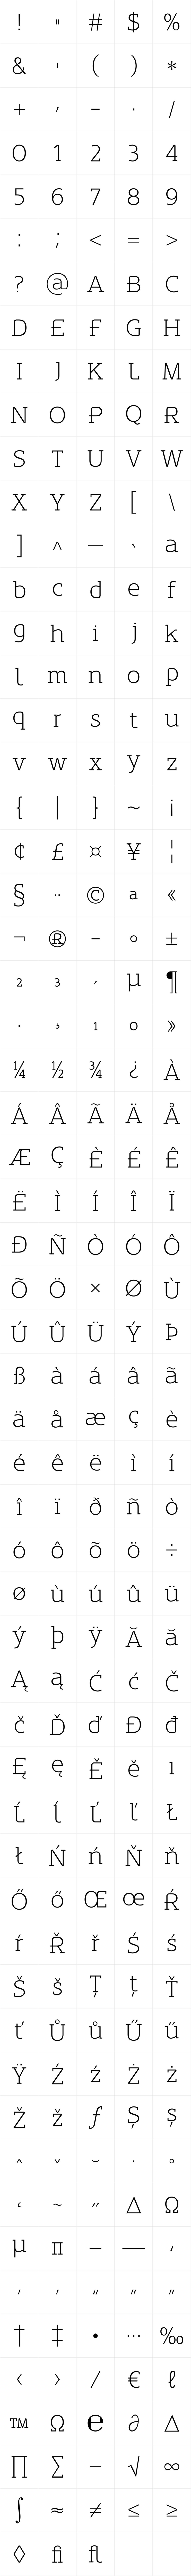 Oblik Serif Light